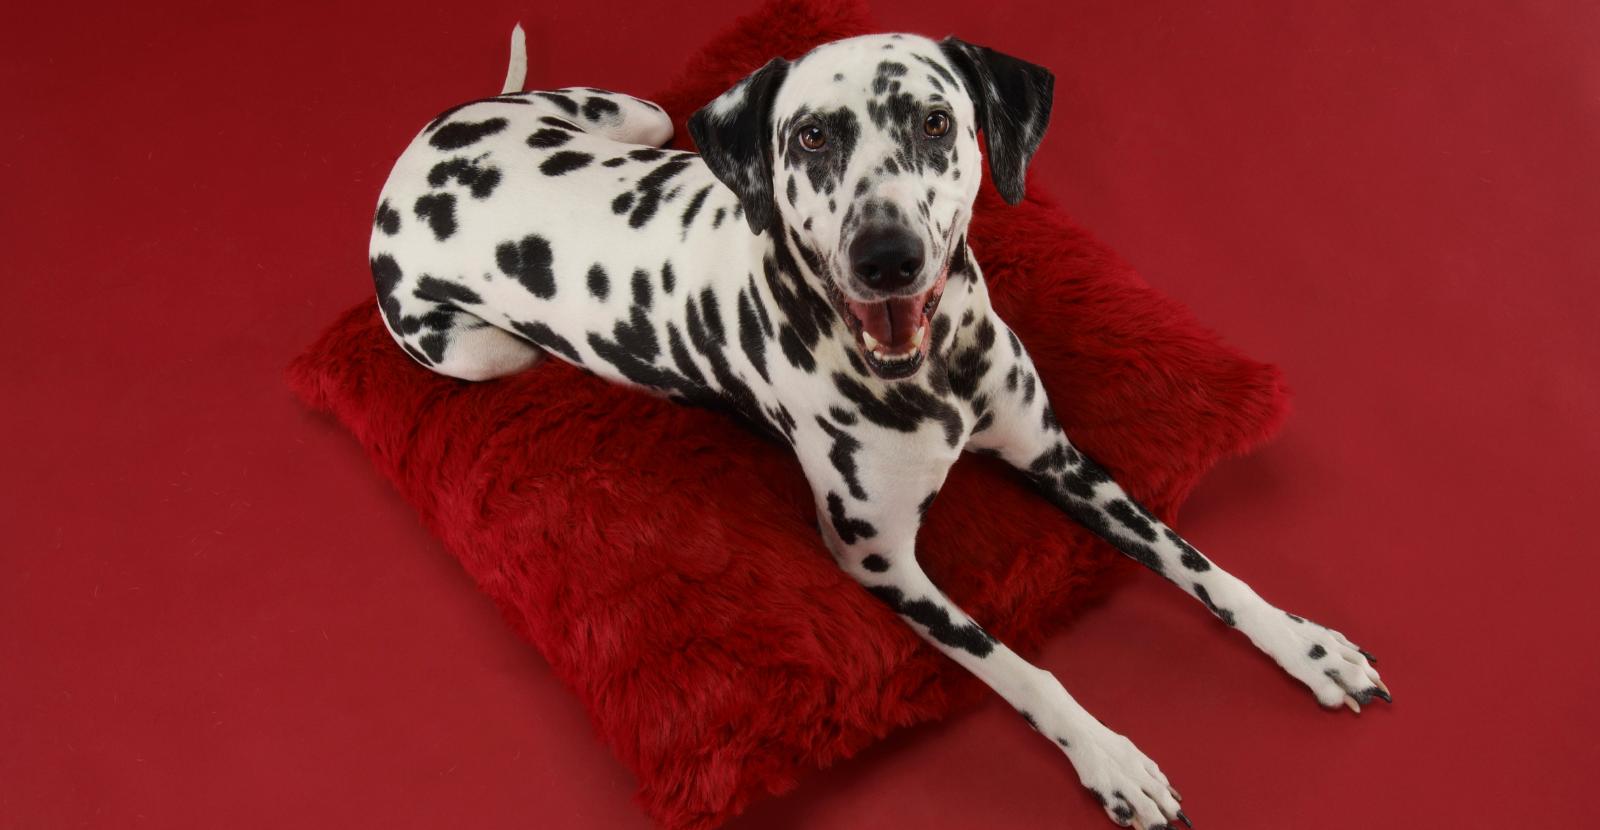 Dalmatian in Red